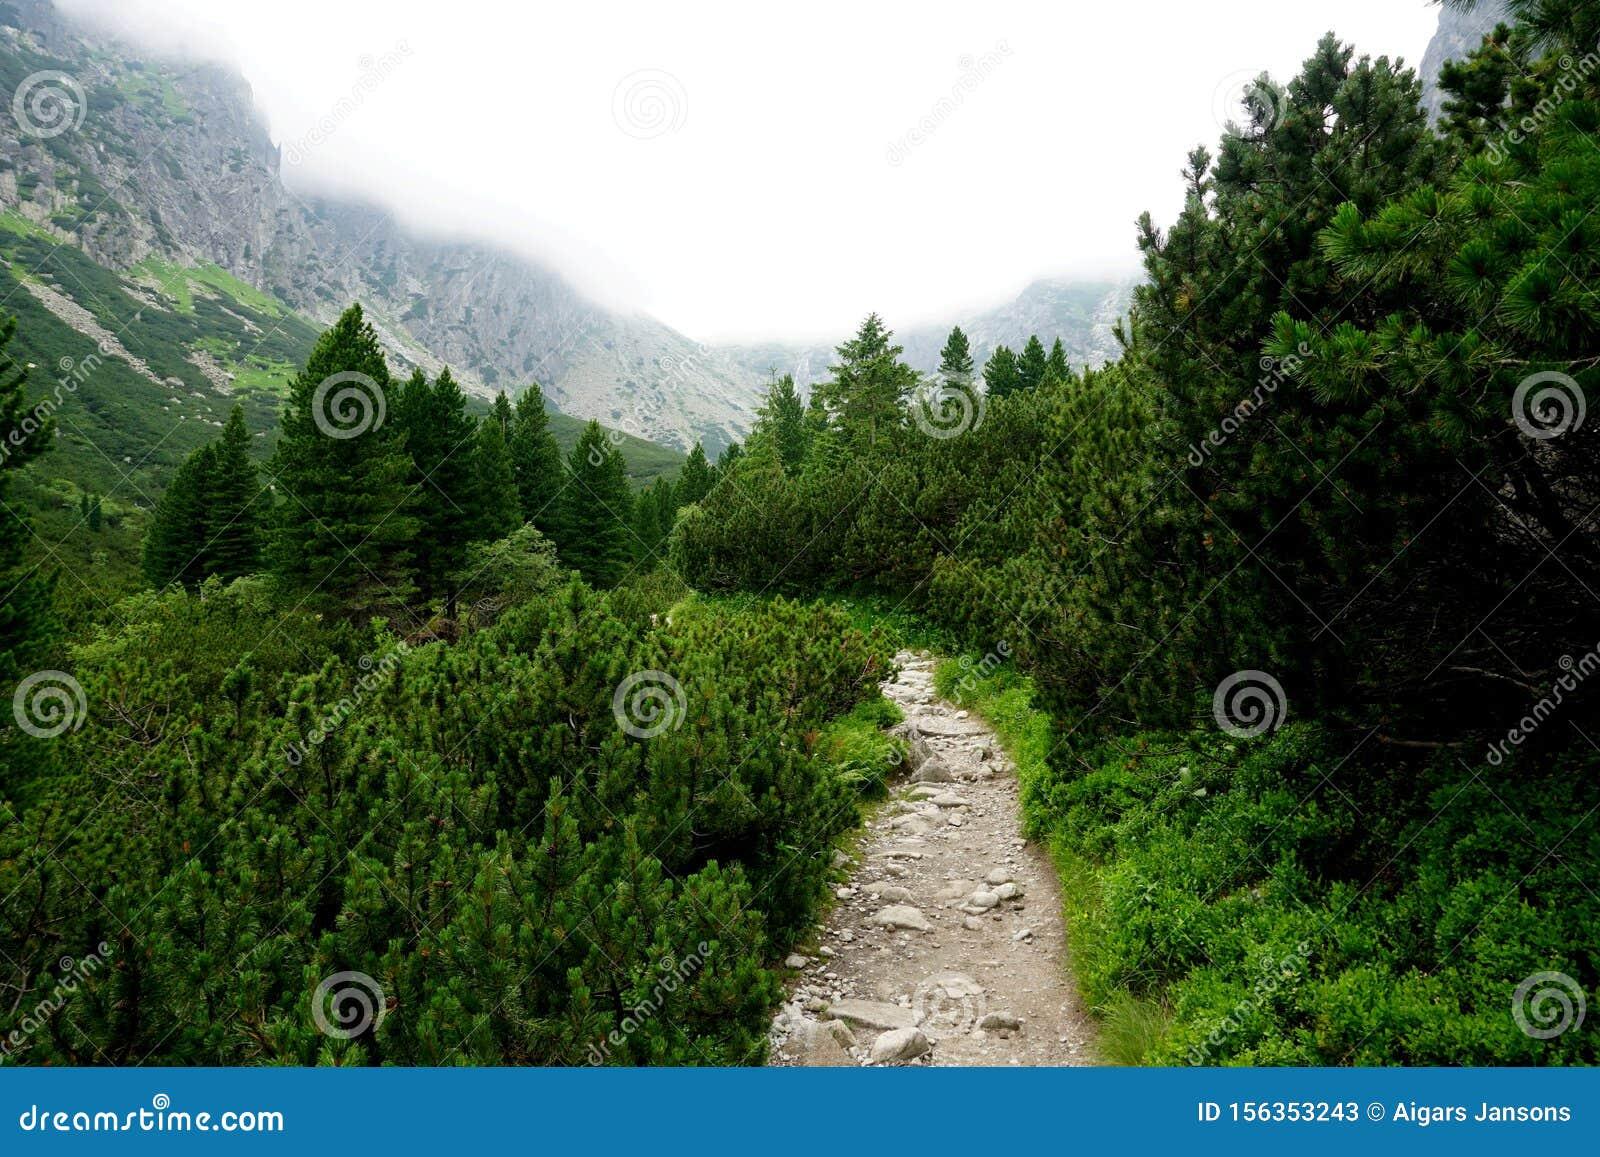 Mountain stone trail through forest in High Tatras.